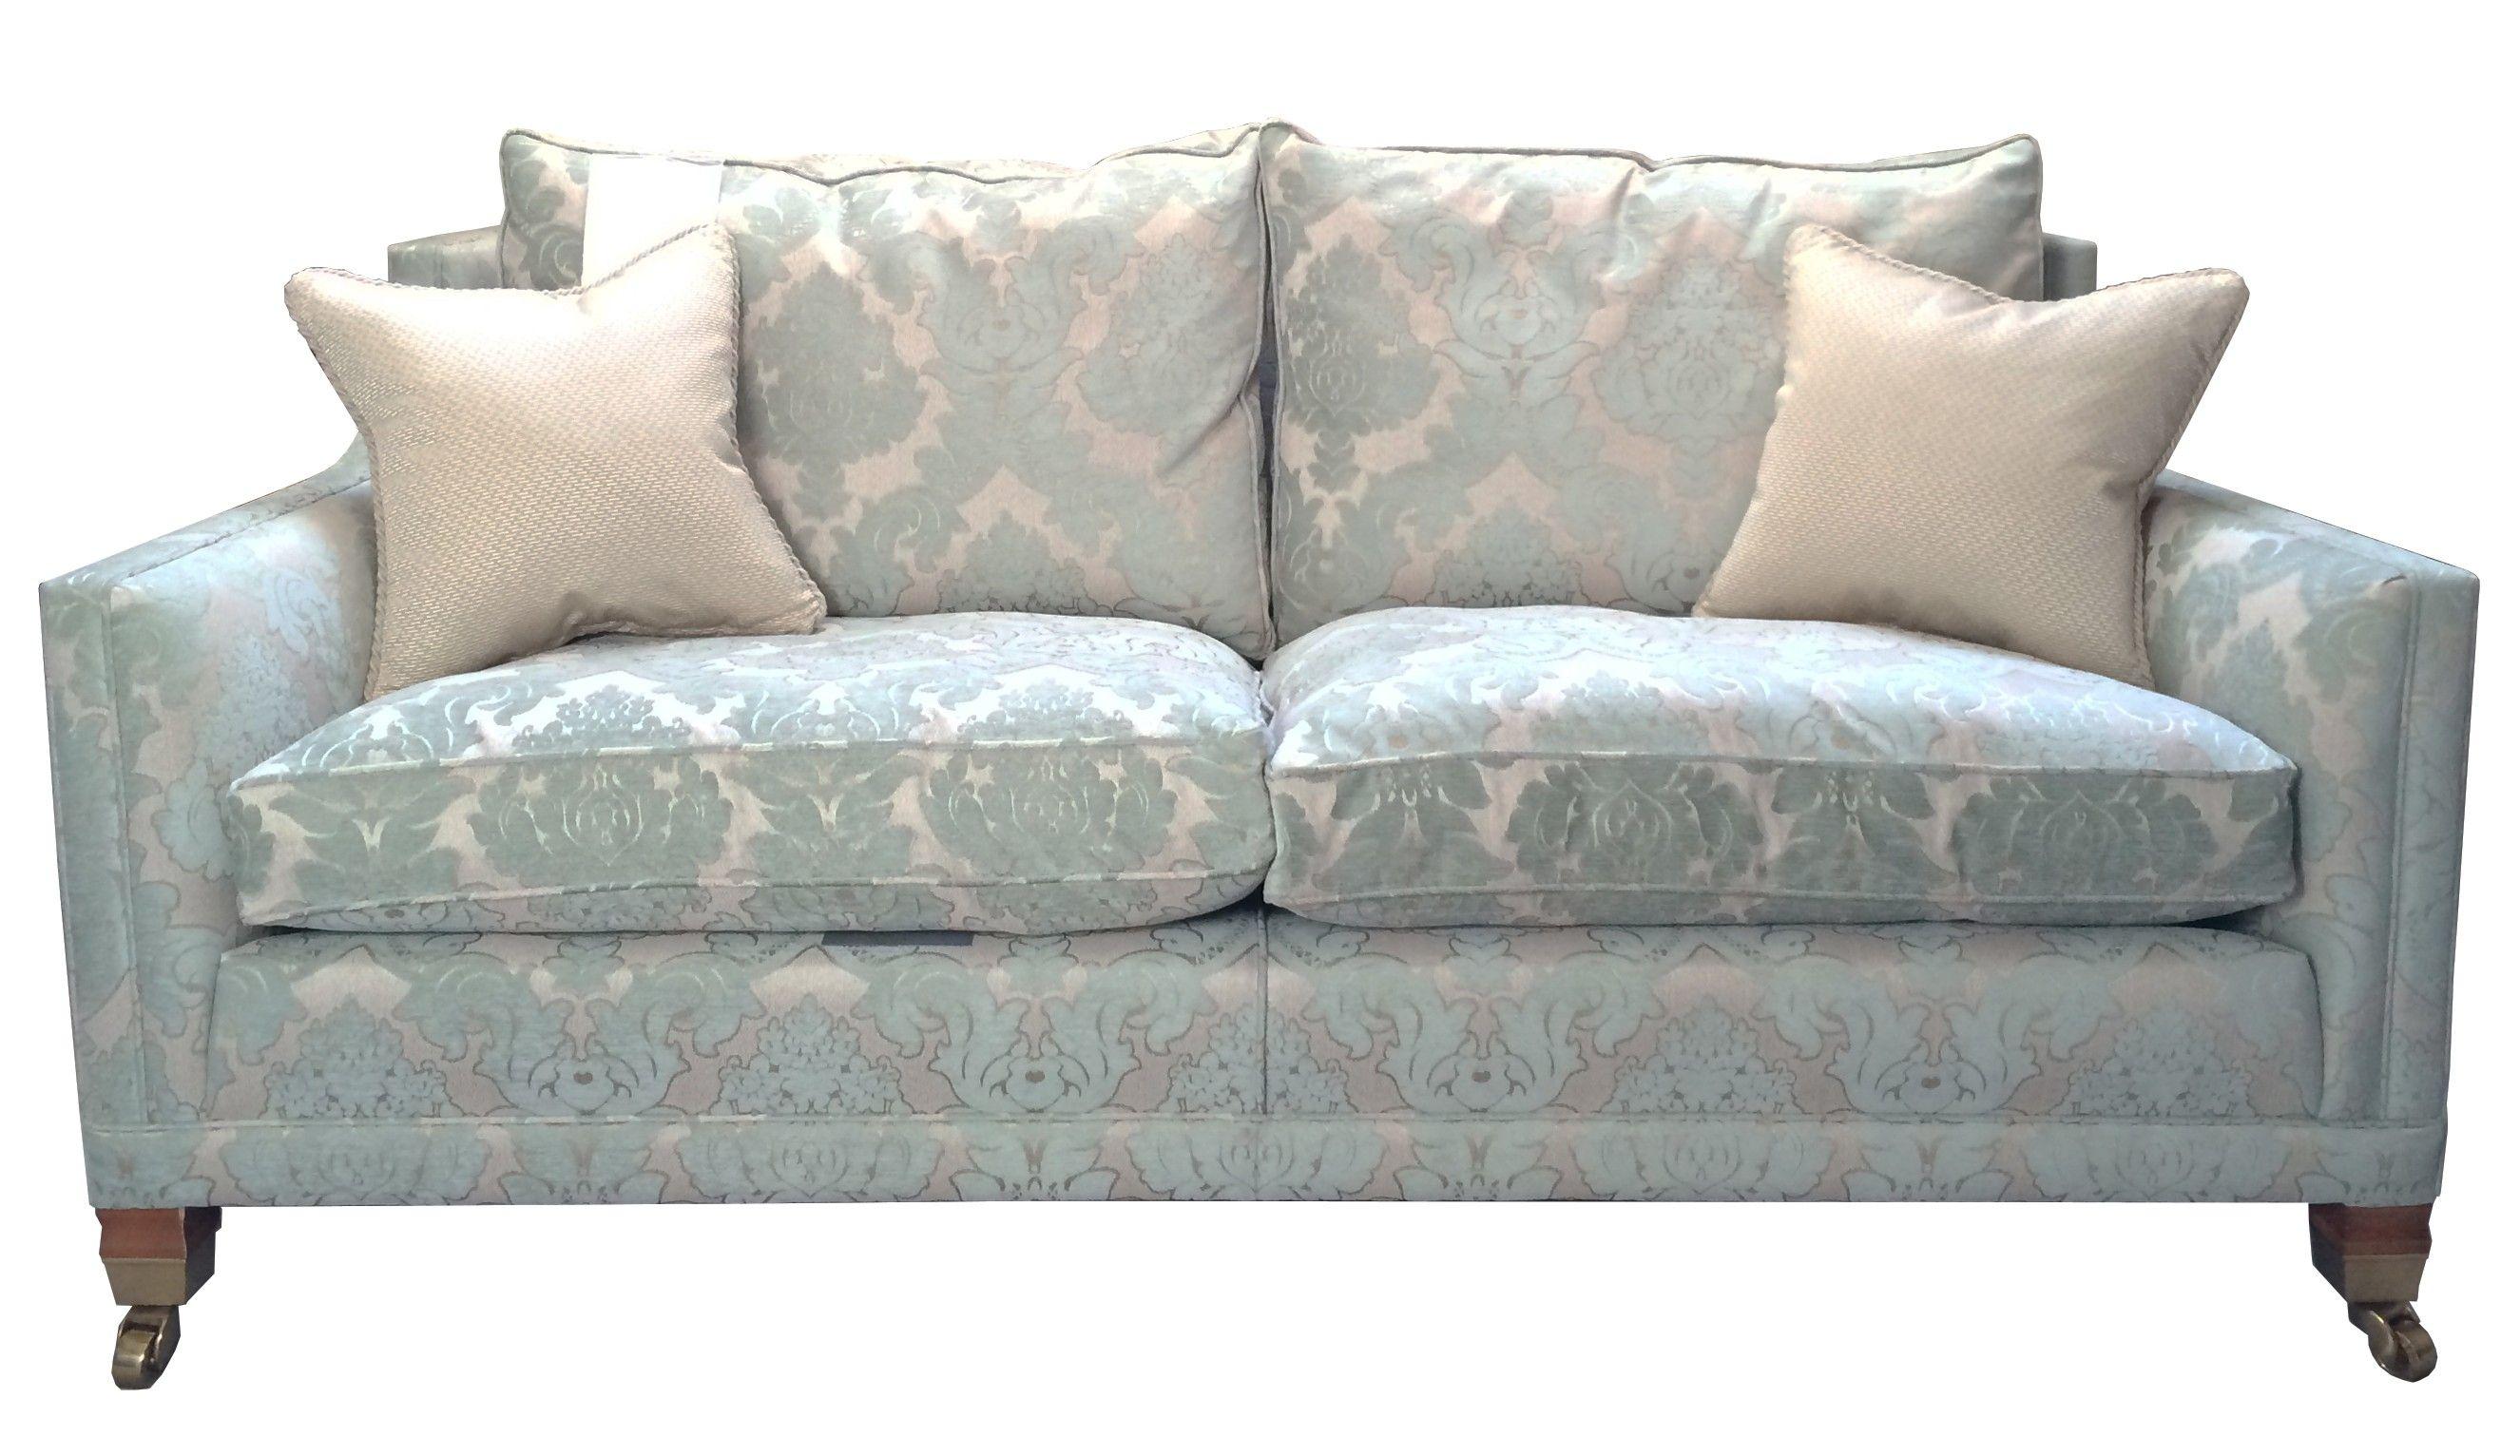 Duresta Clearance Villeneuve Medium sofa